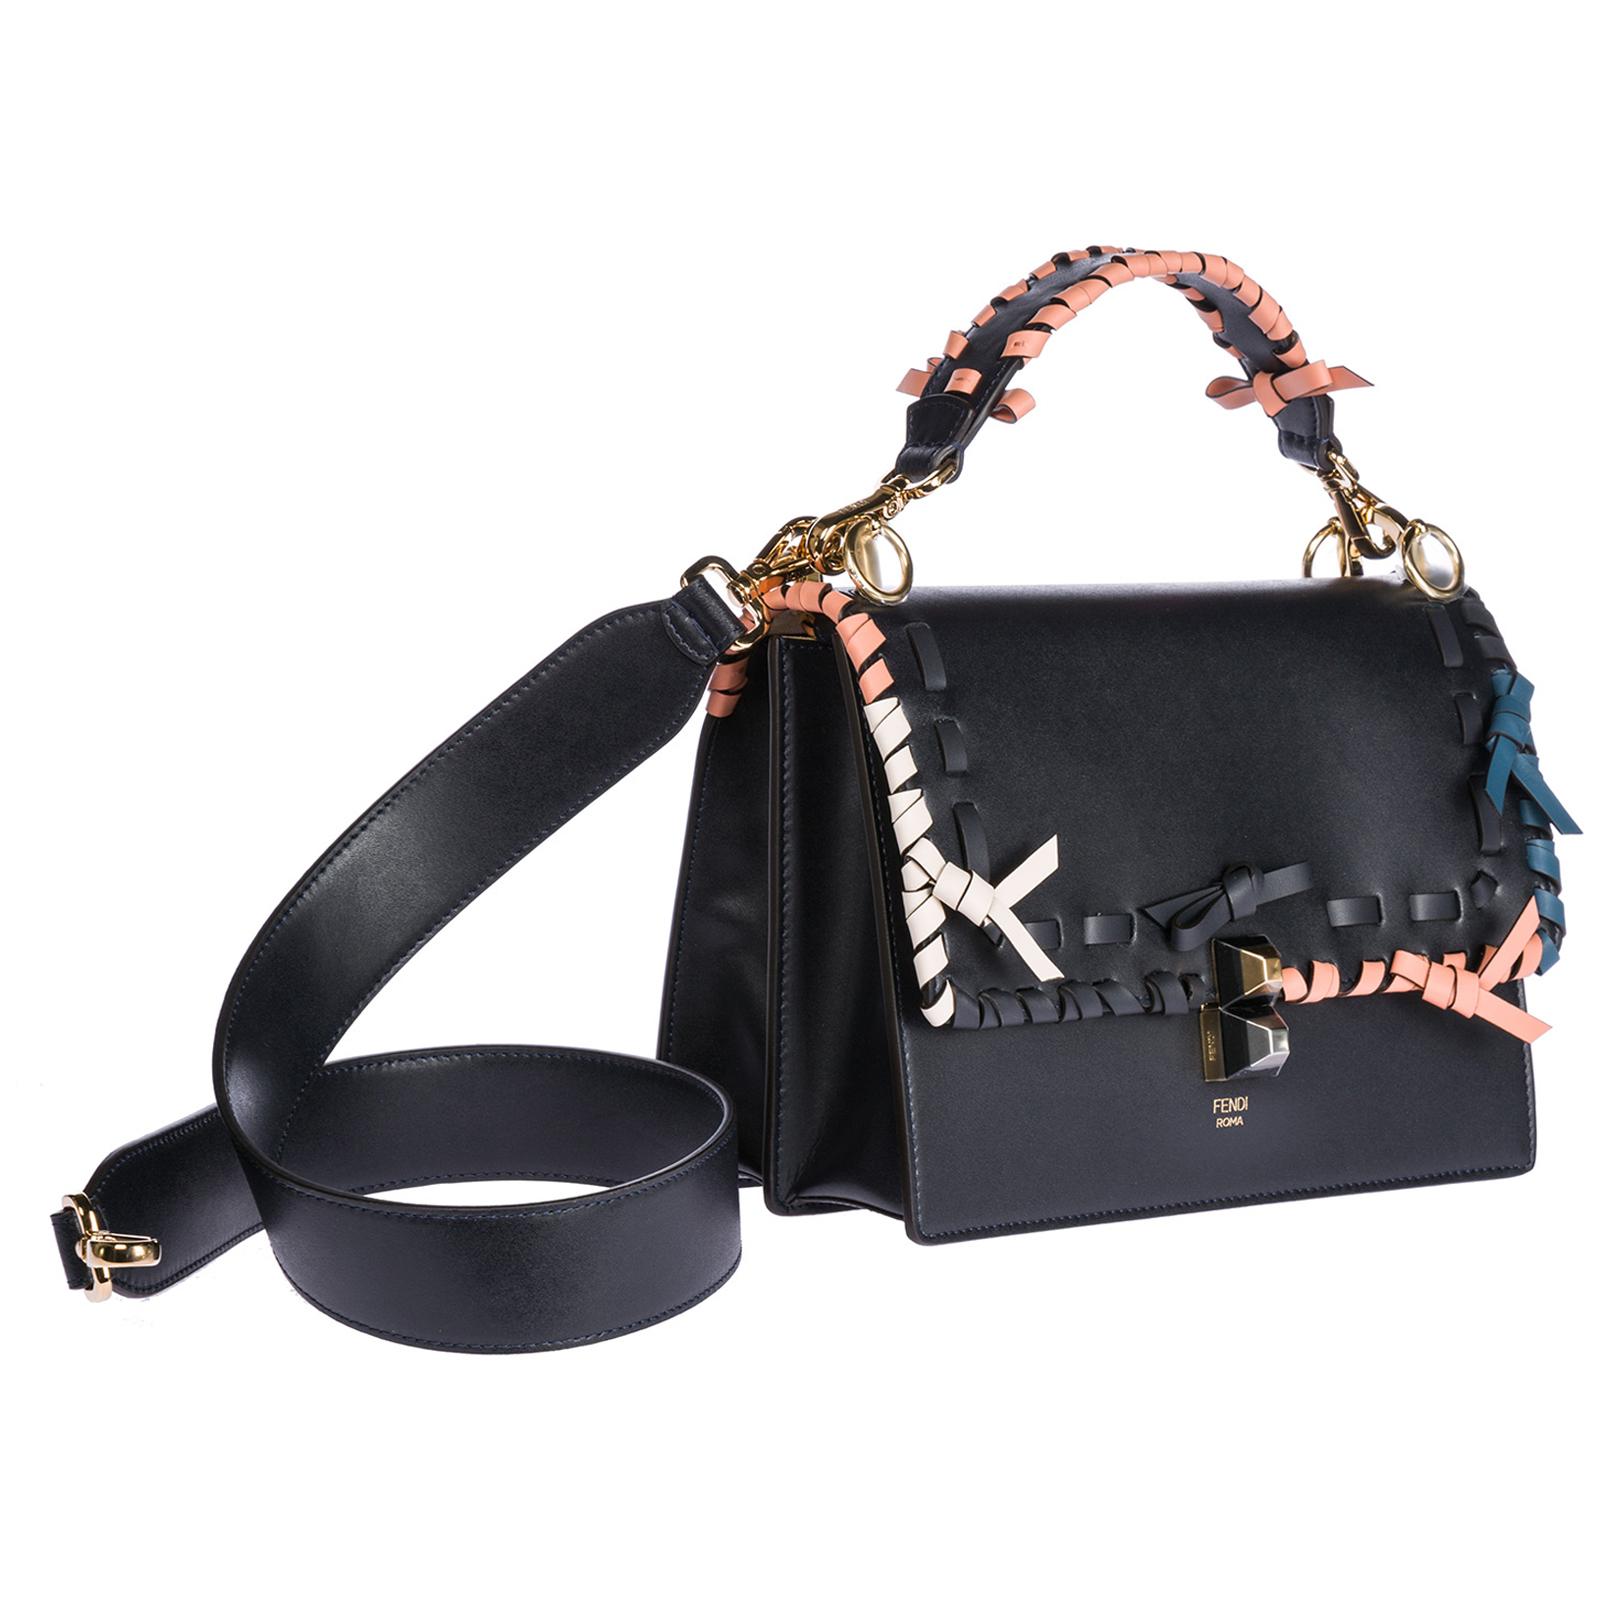 ... i Women s leather handbag shopping bag purse kan ... 8473b15cdfc75